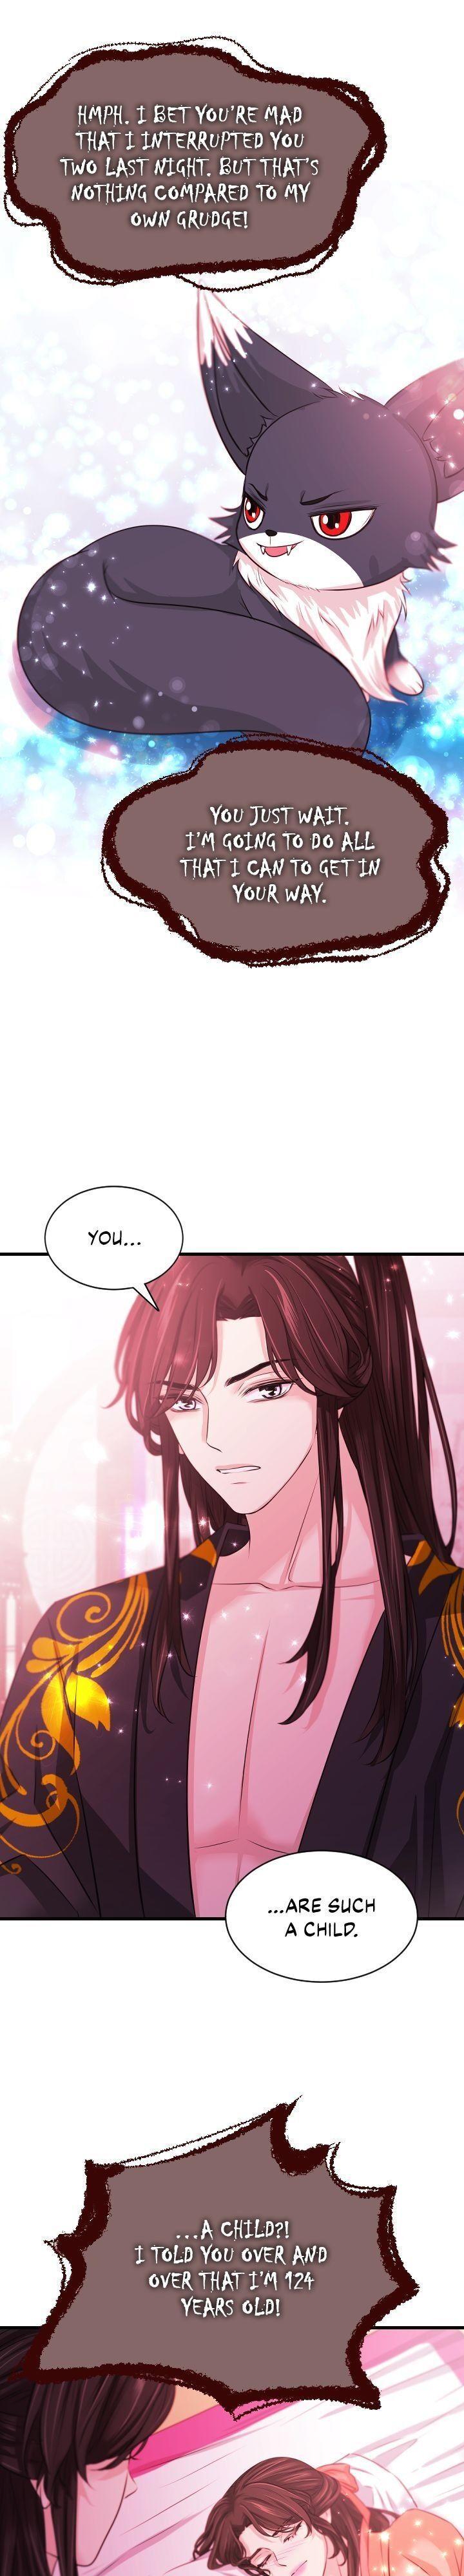 An Inescapable Love Chapter 49 page 4 - Mangakakalots.com